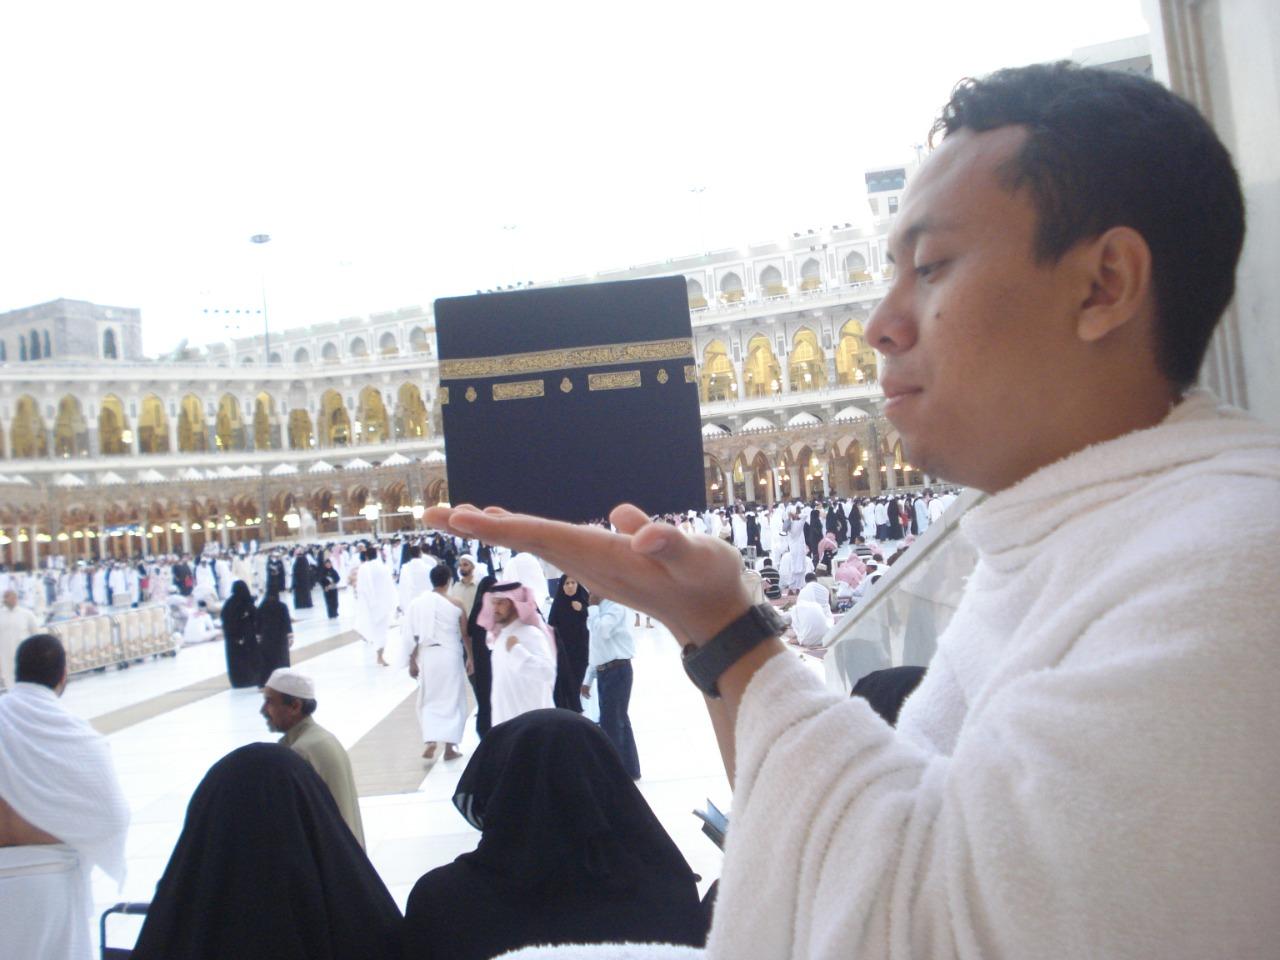 Alhamdulillah, akhirnya saya berkesempatan untuk menunaikan ibadah haji dan umroh